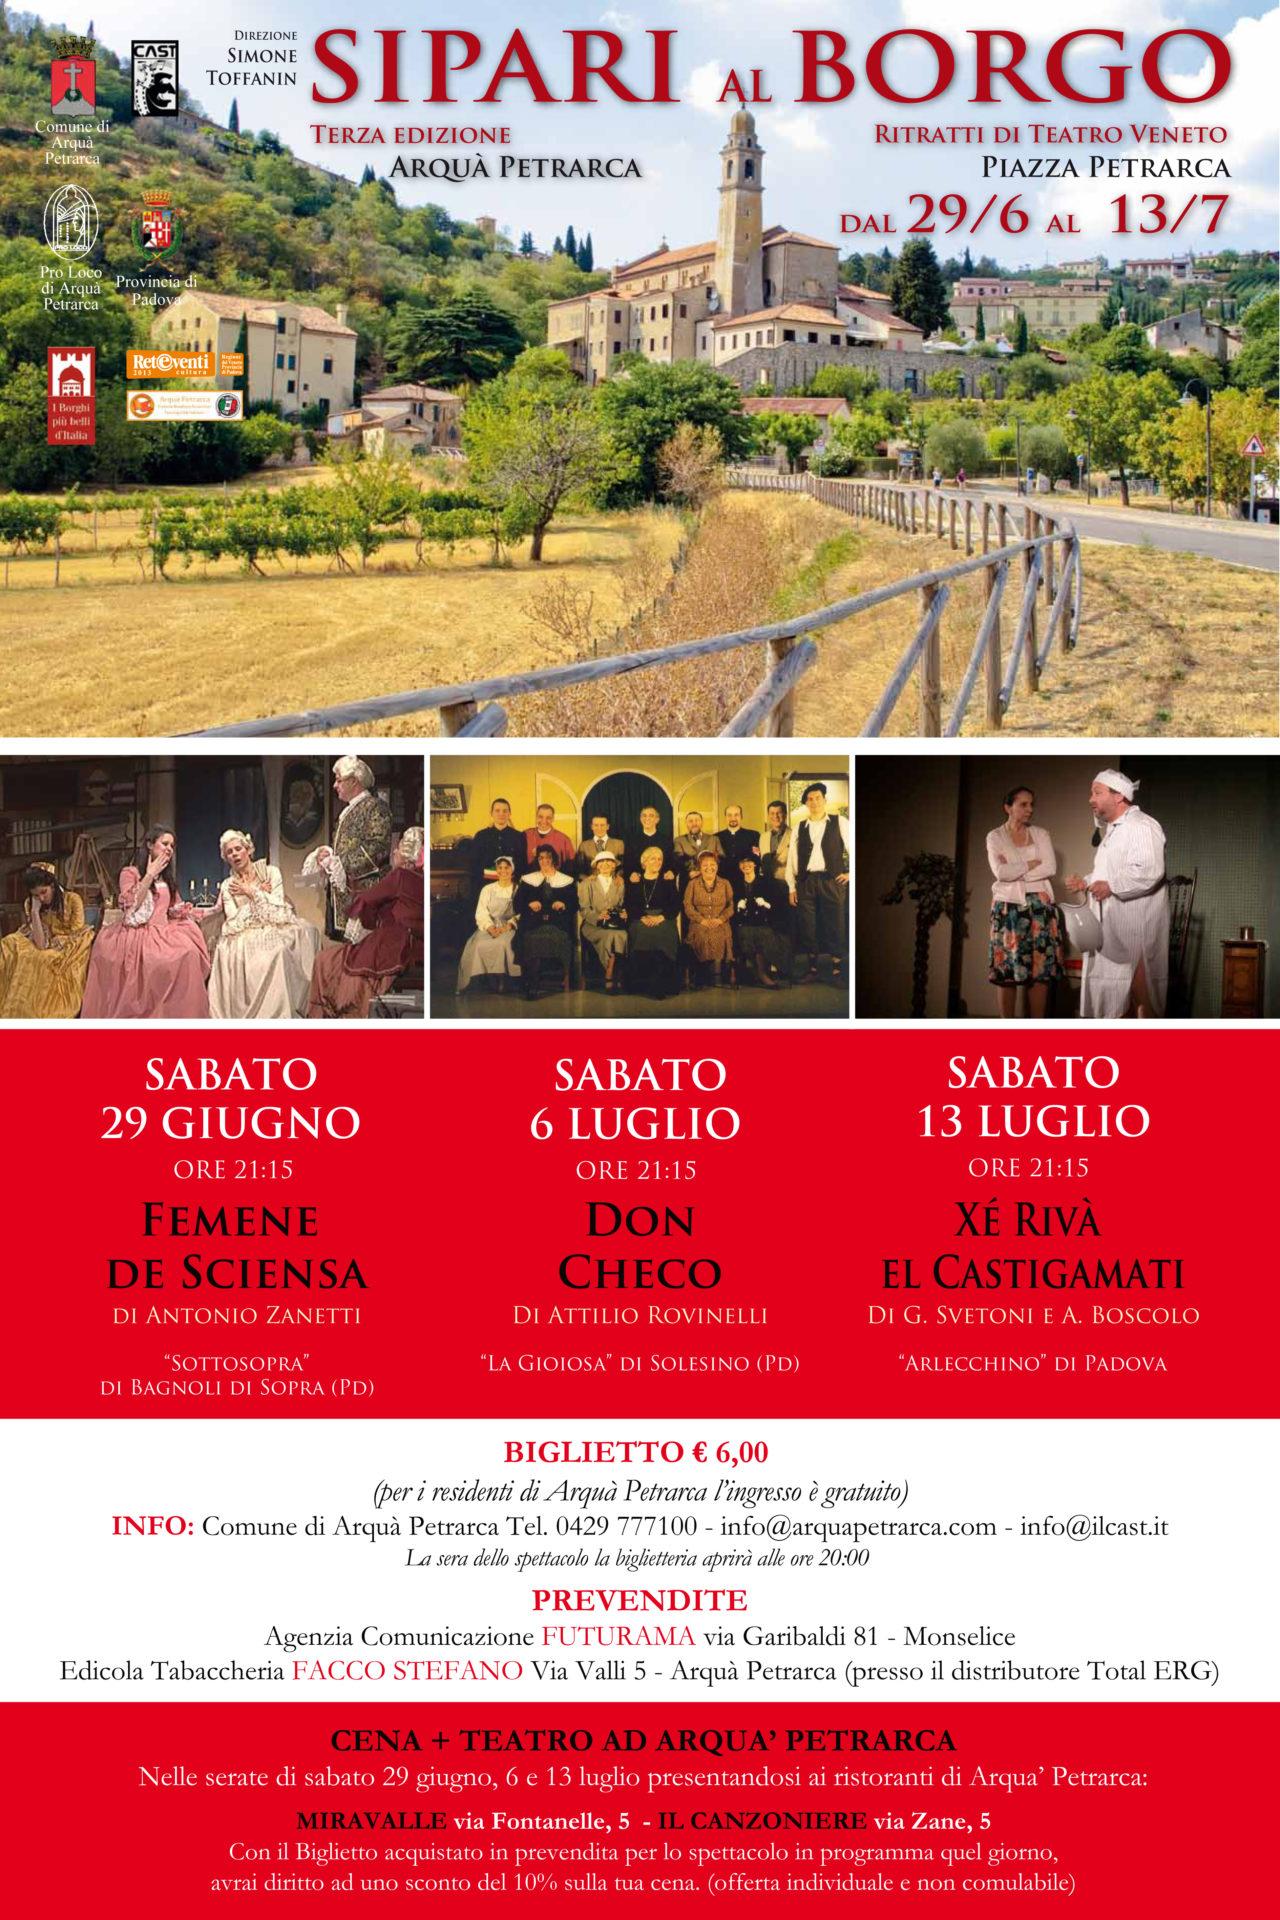 Sipari al Borgo 2013